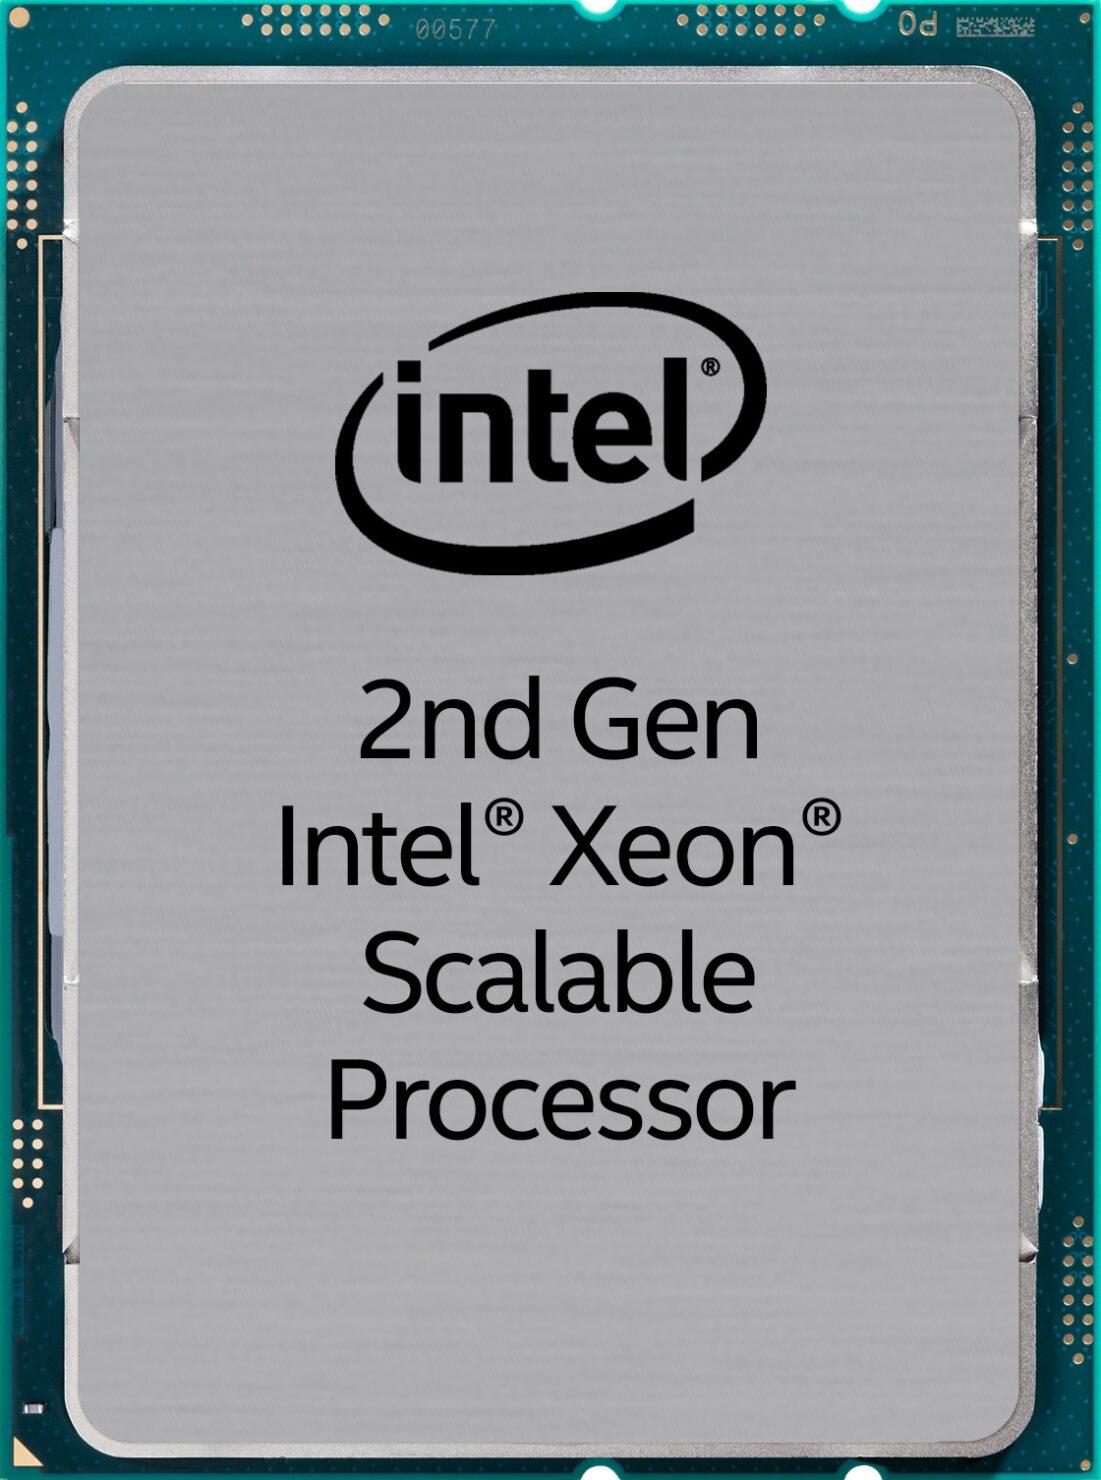 intel-2nd-gen-xeon-scalable-1